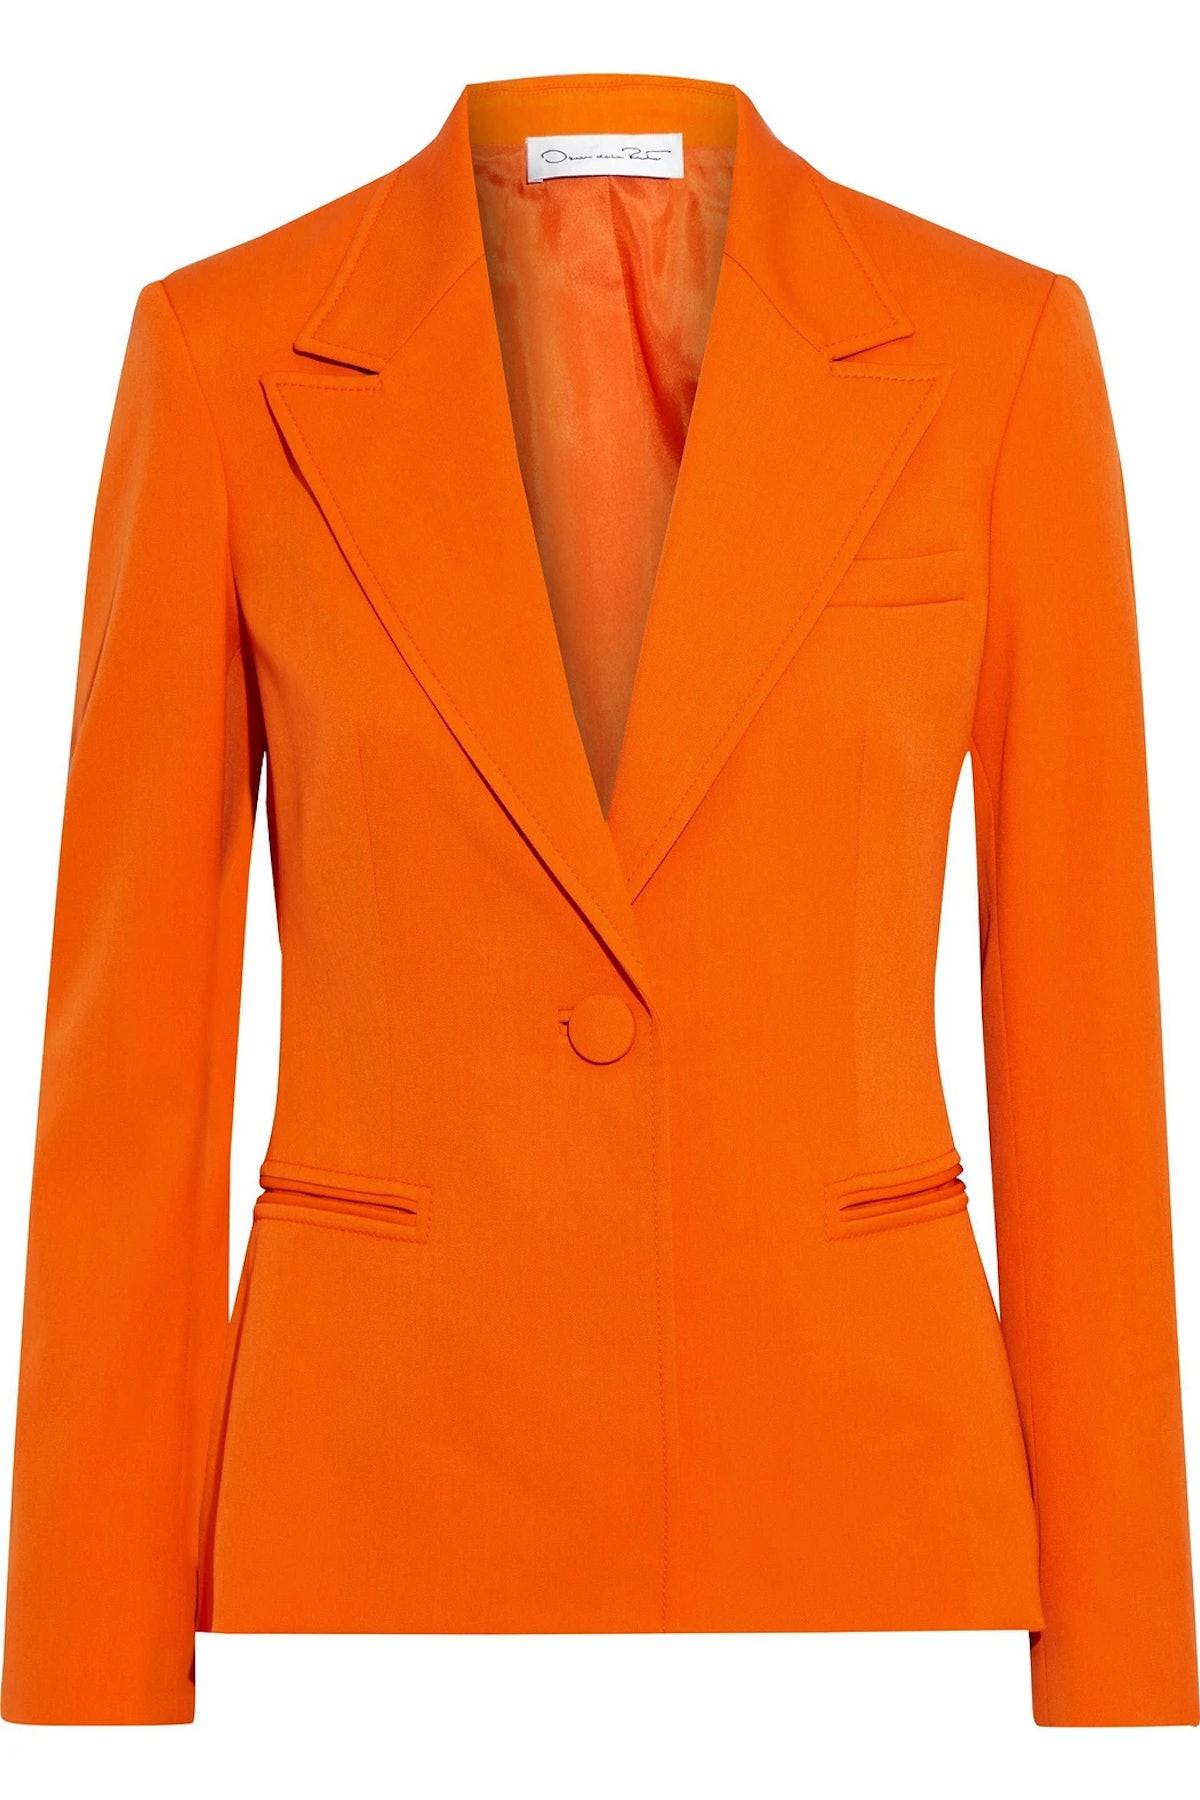 Bright orange wool-blend twill blazer from Oscar de la Renta, available to shop on The Outnet.